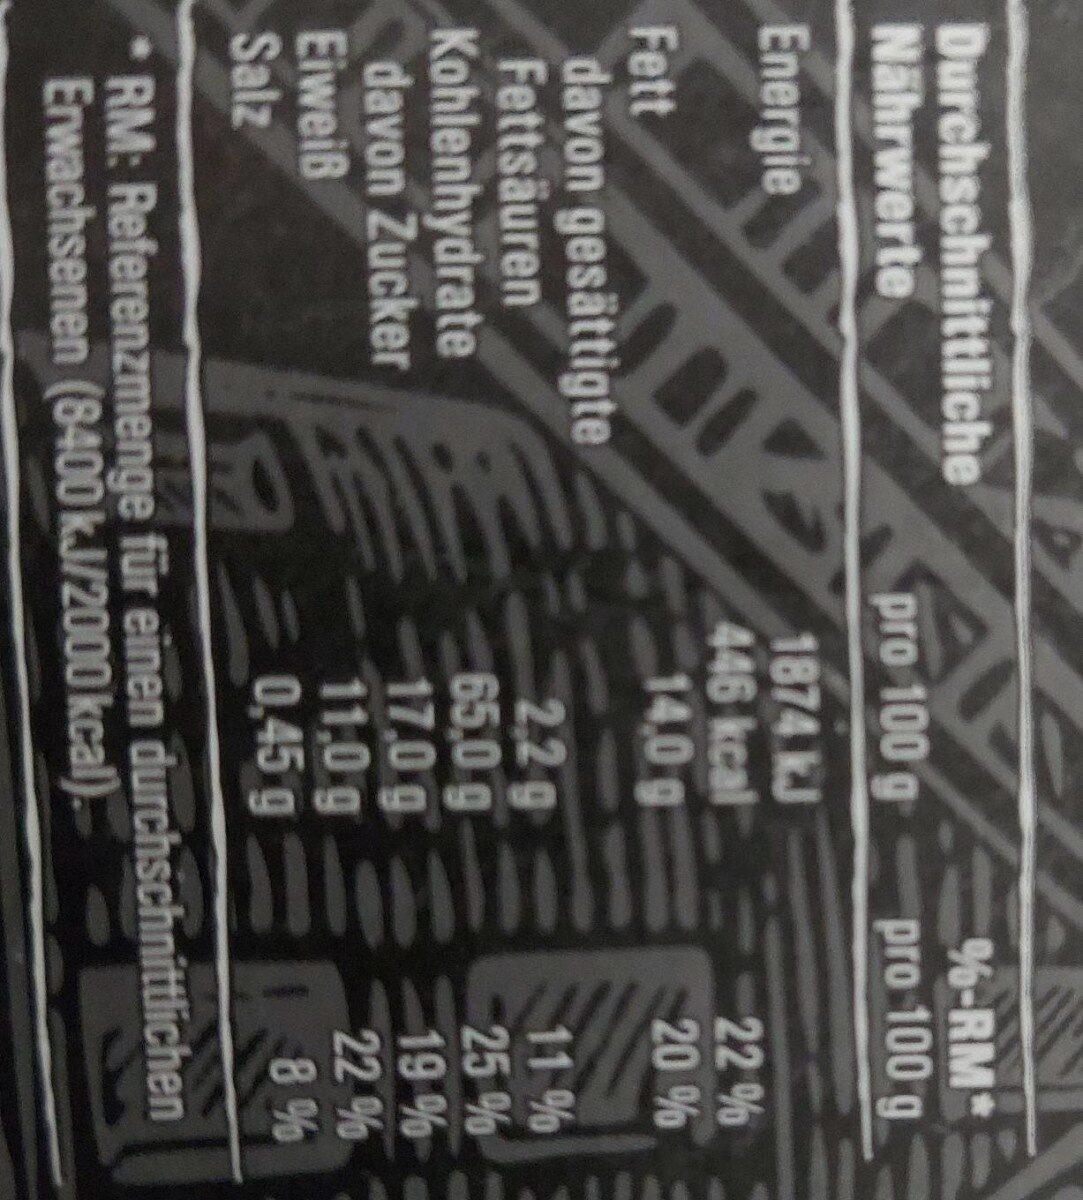 Premium knusper Müsli - Valori nutrizionali - de